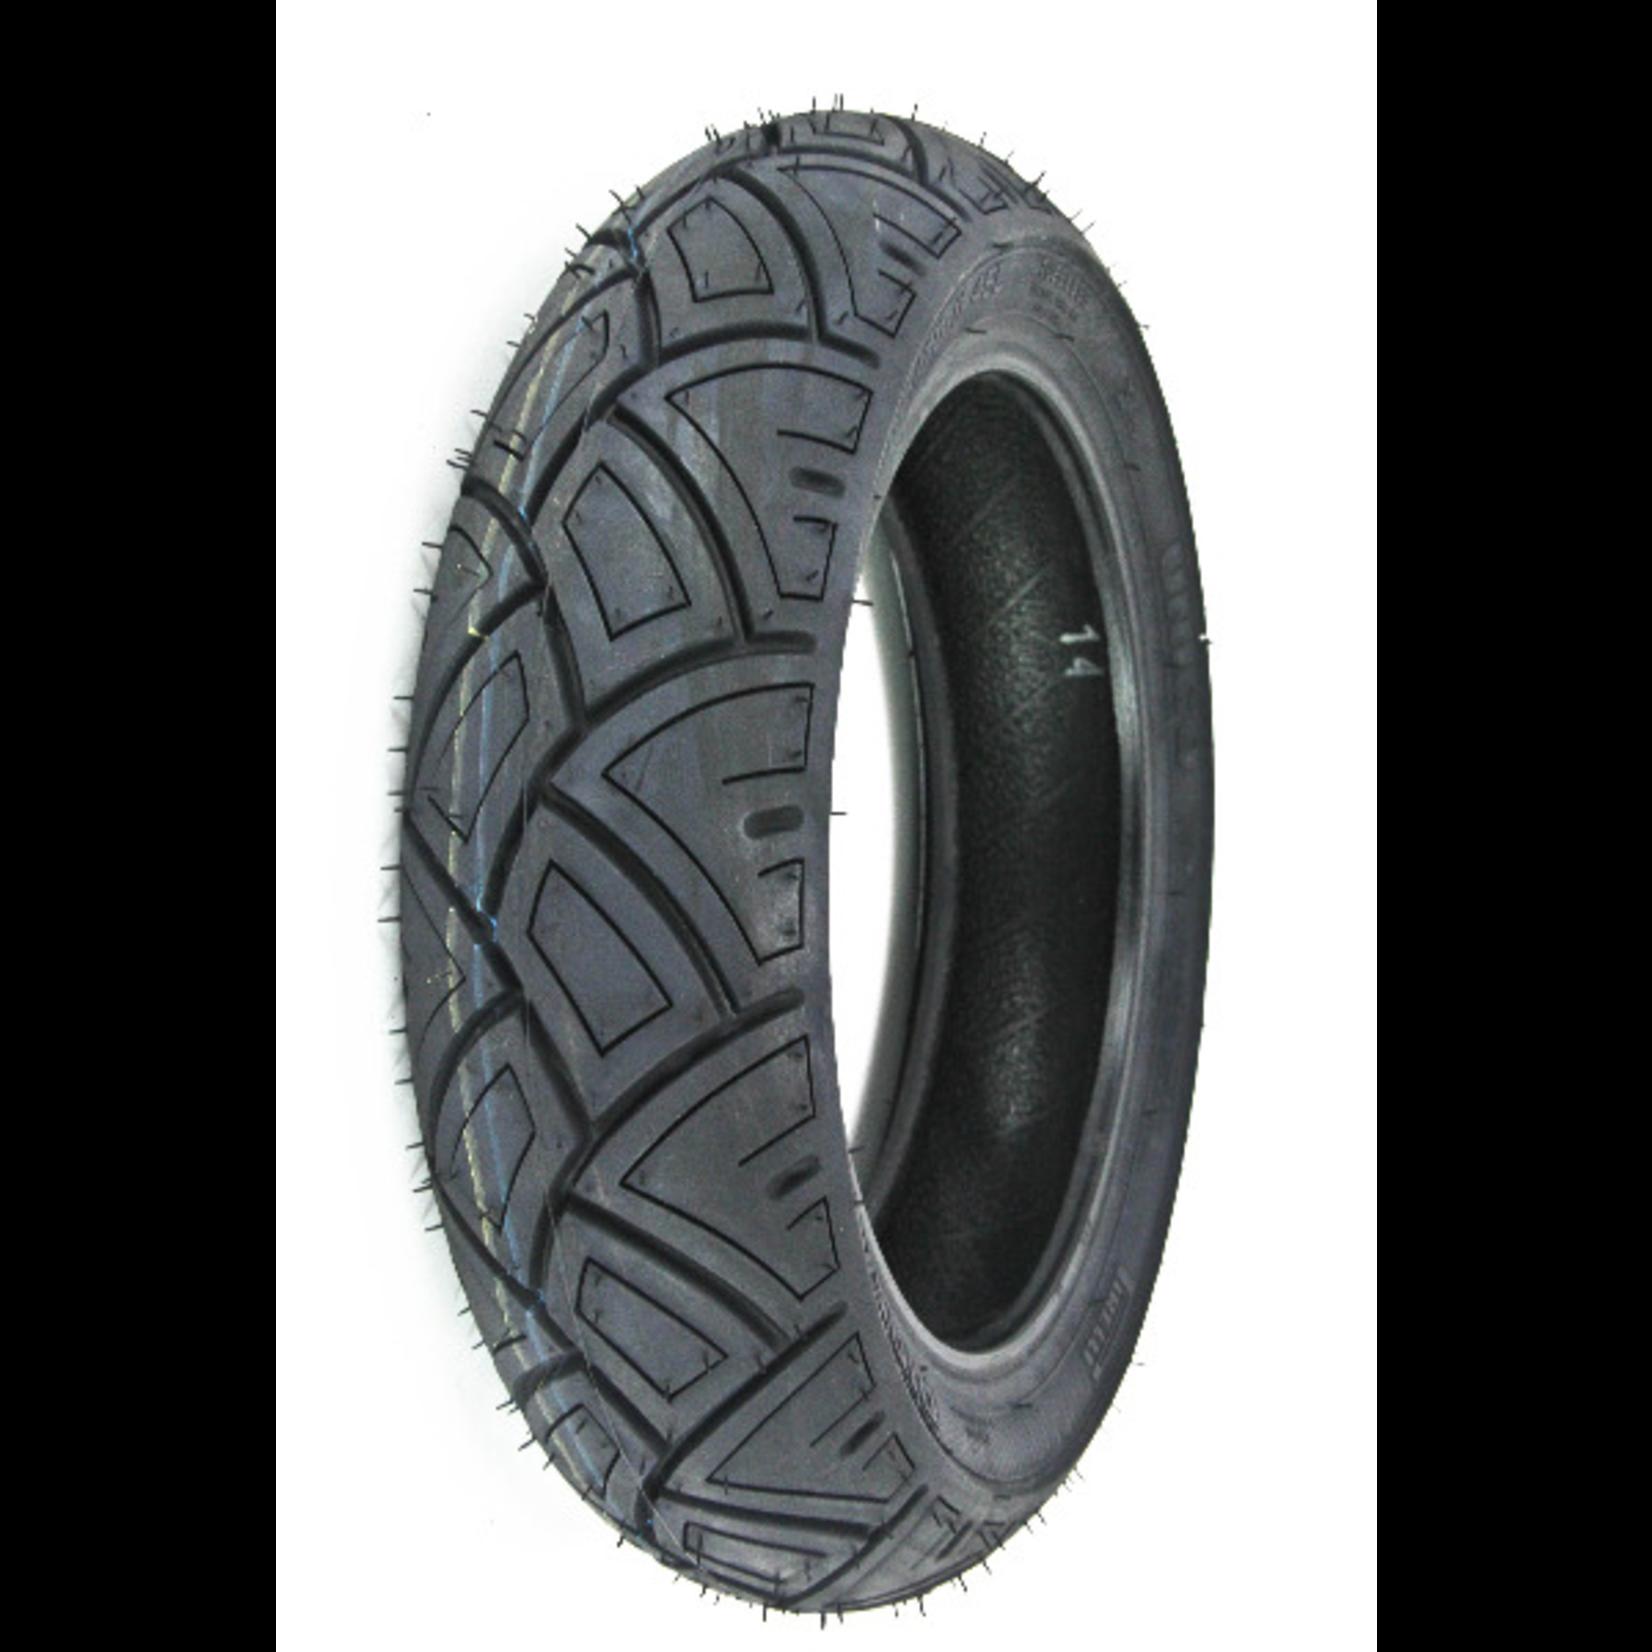 Parts Tire, 100/80-10 Pirelli SL38